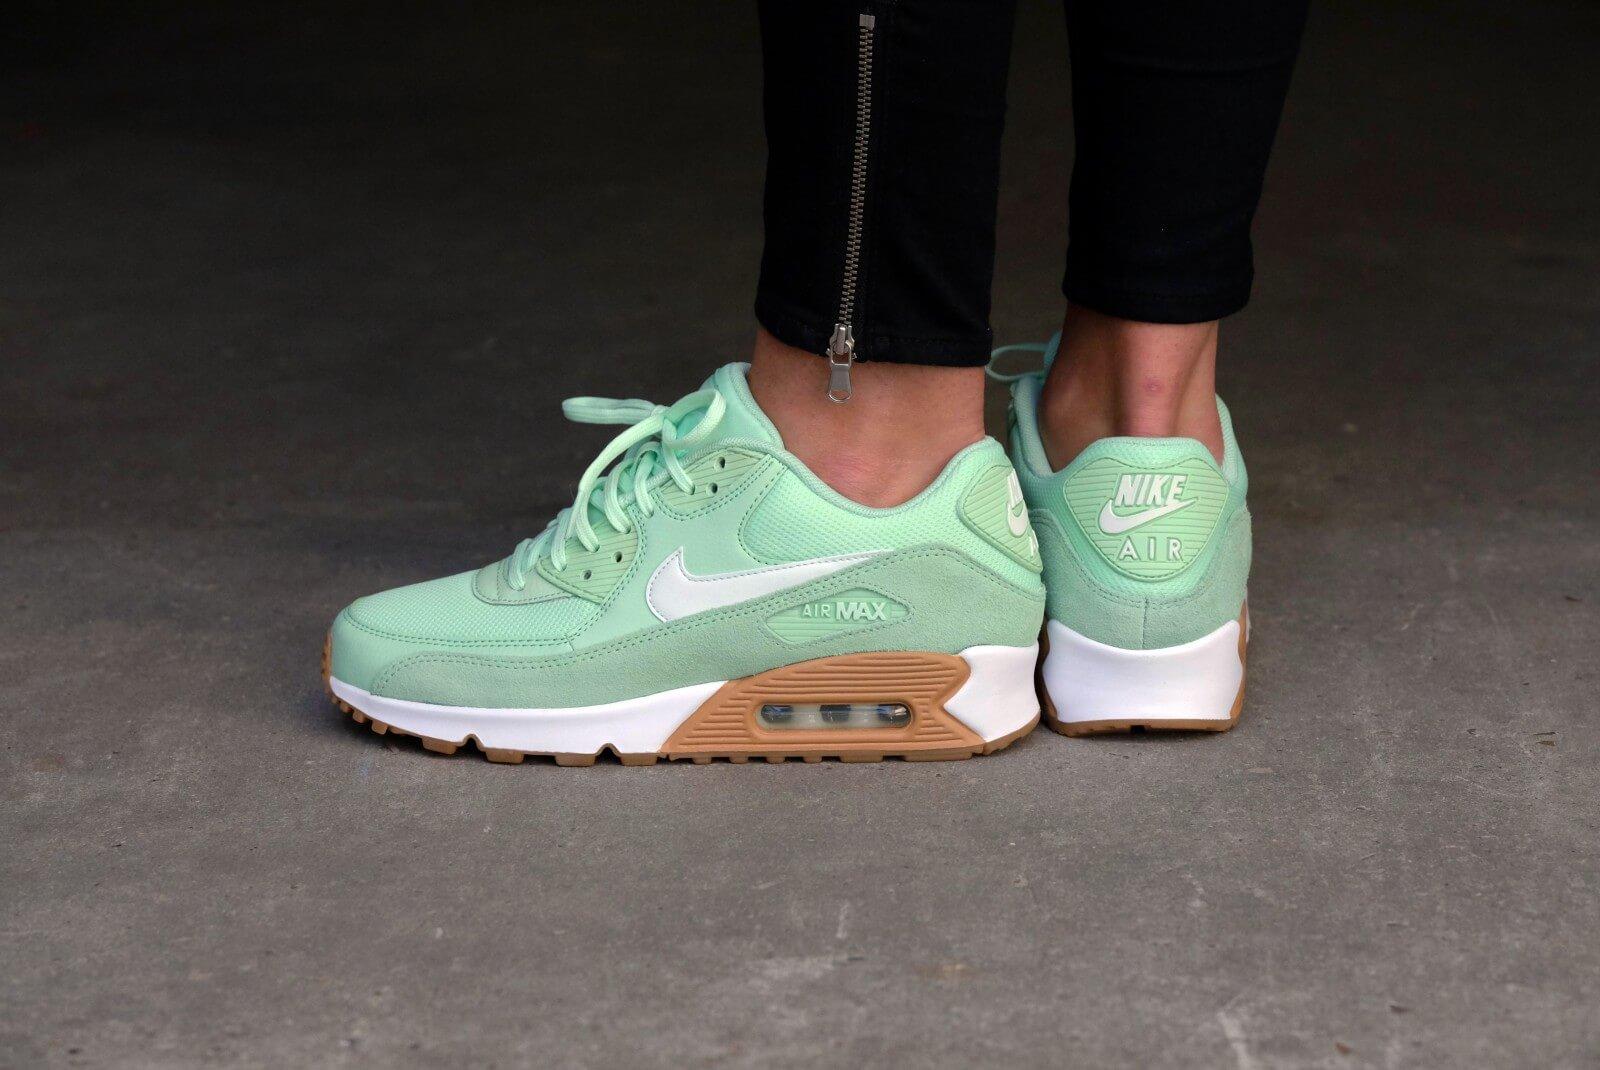 Nike WMNS Air Max 90 Fresh MintBarely Green Gum Light Brown 325213 307